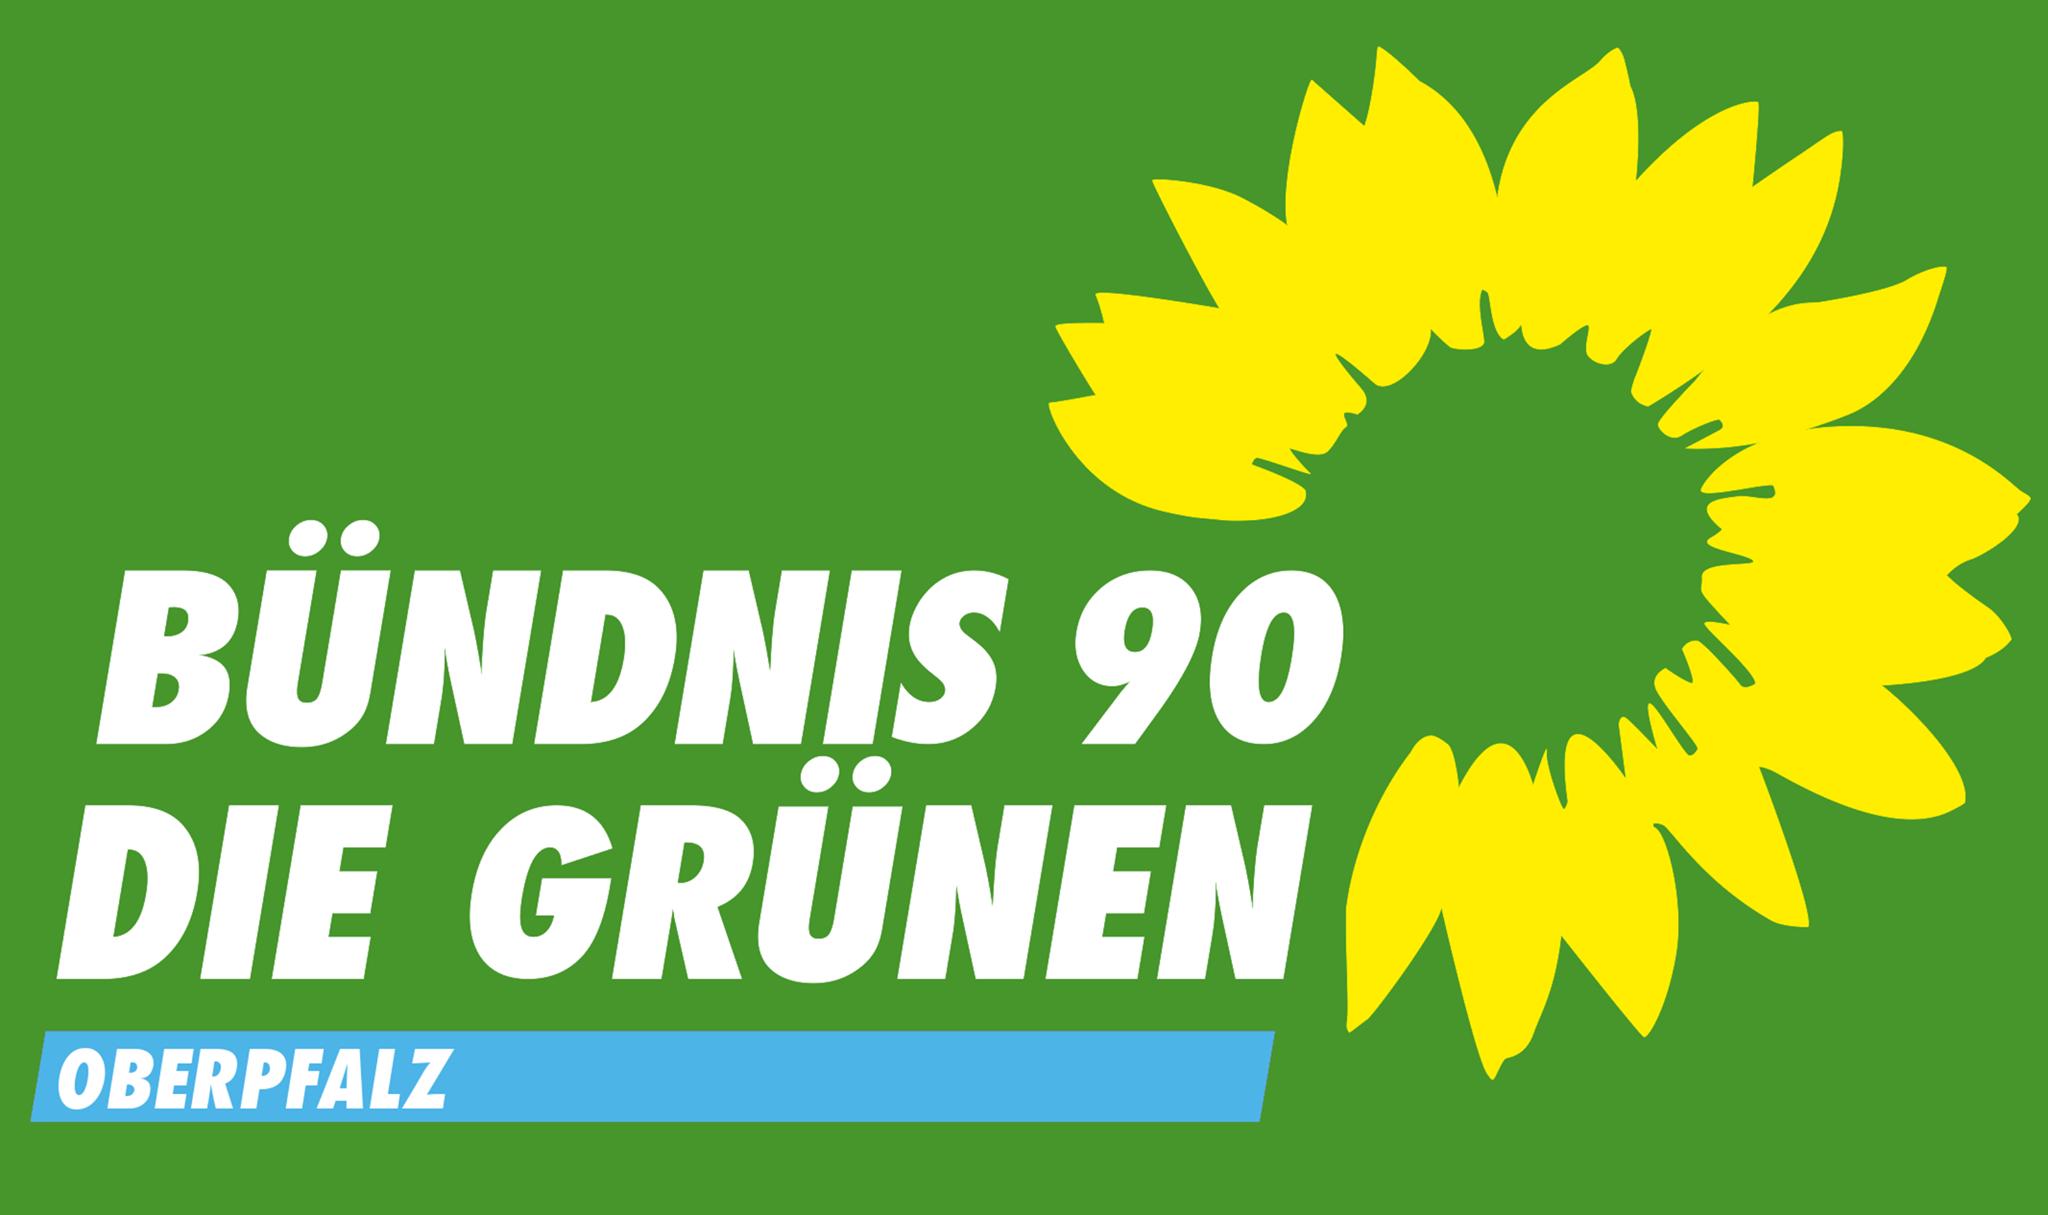 Bündnis 90 / Die Grünen Oberpfalz